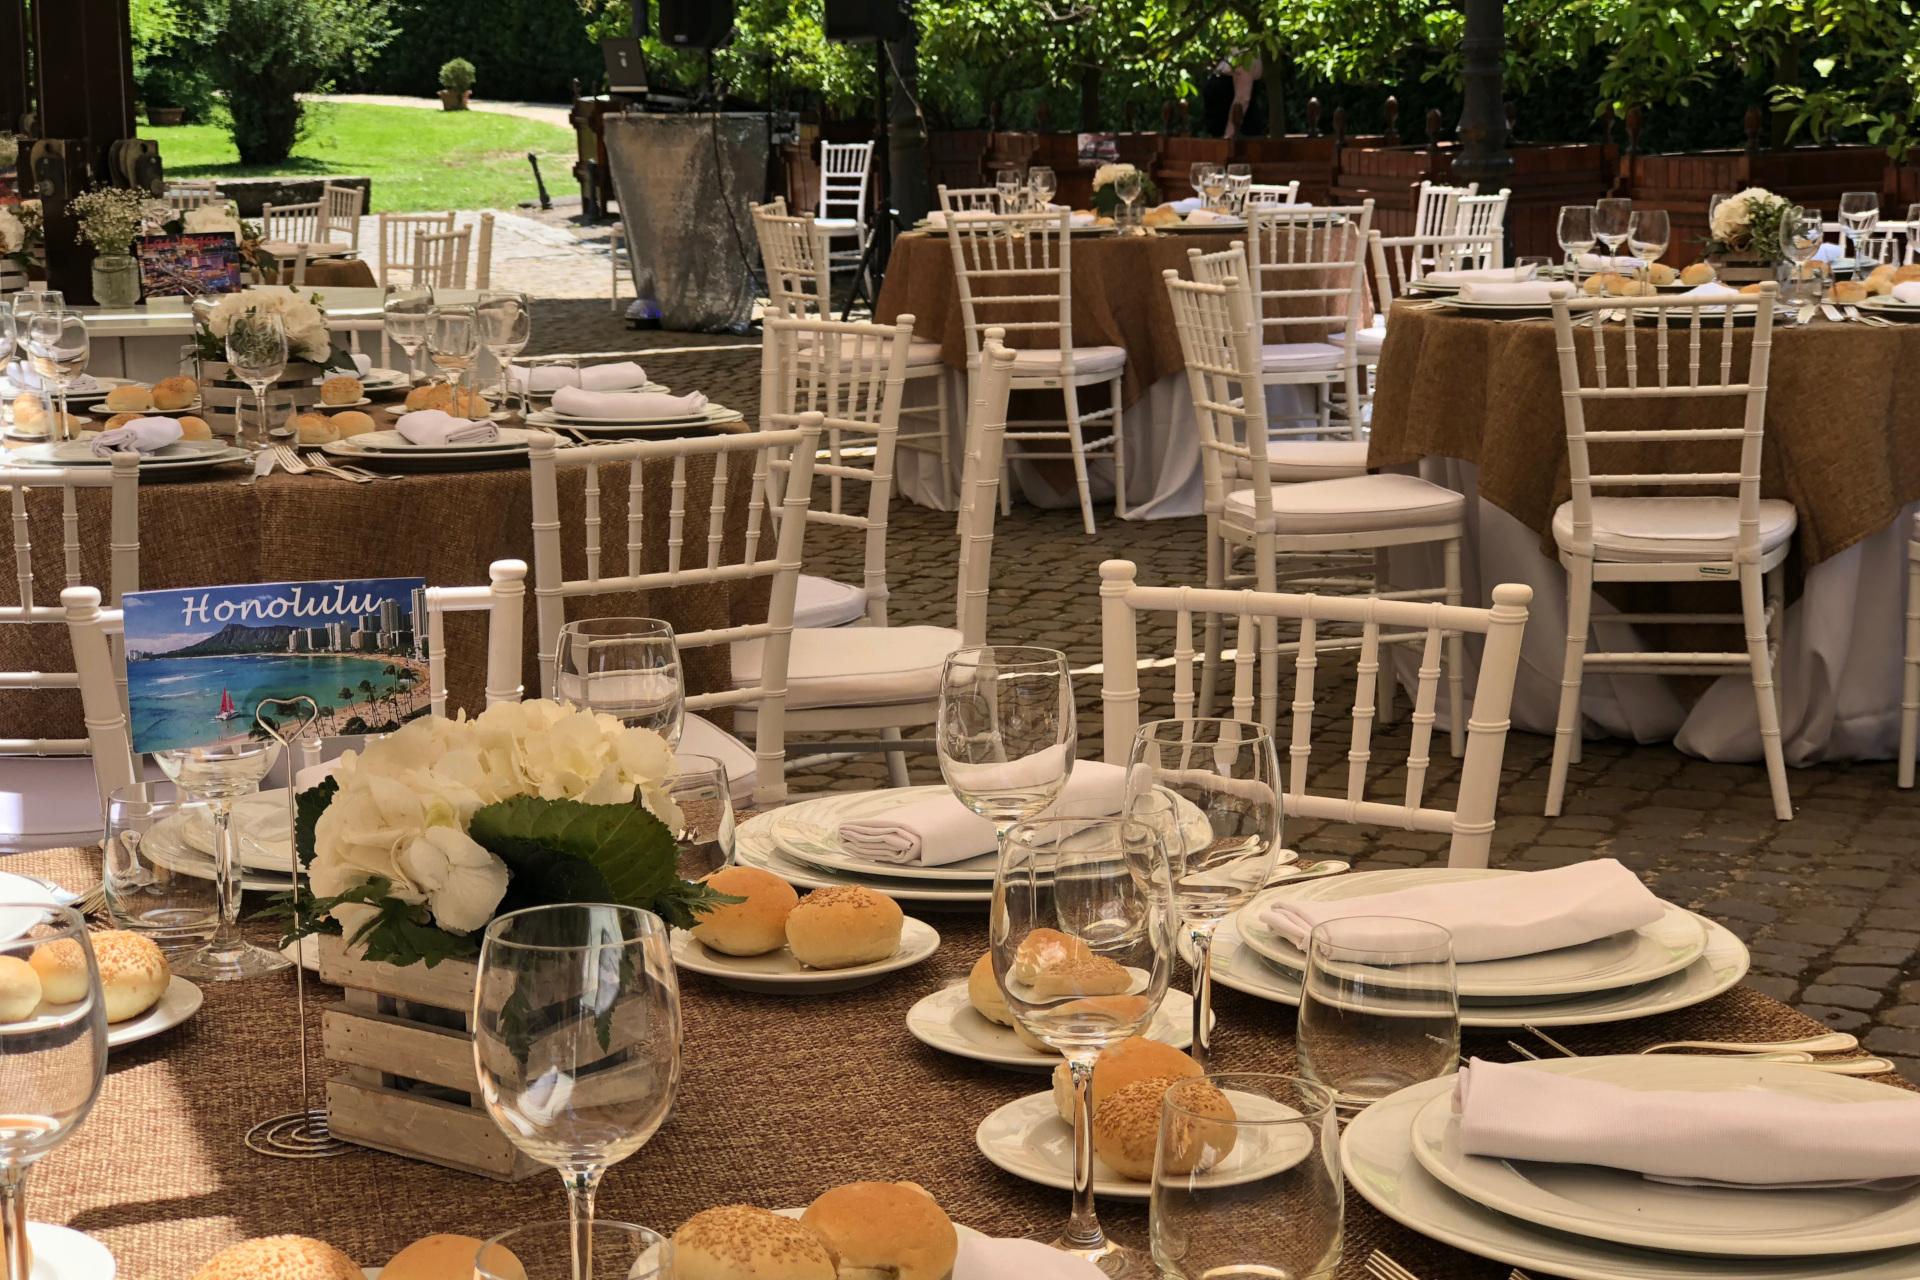 Matrimonio In Epoca Romana : Matrimonio country roma maan catering banqueting frascati